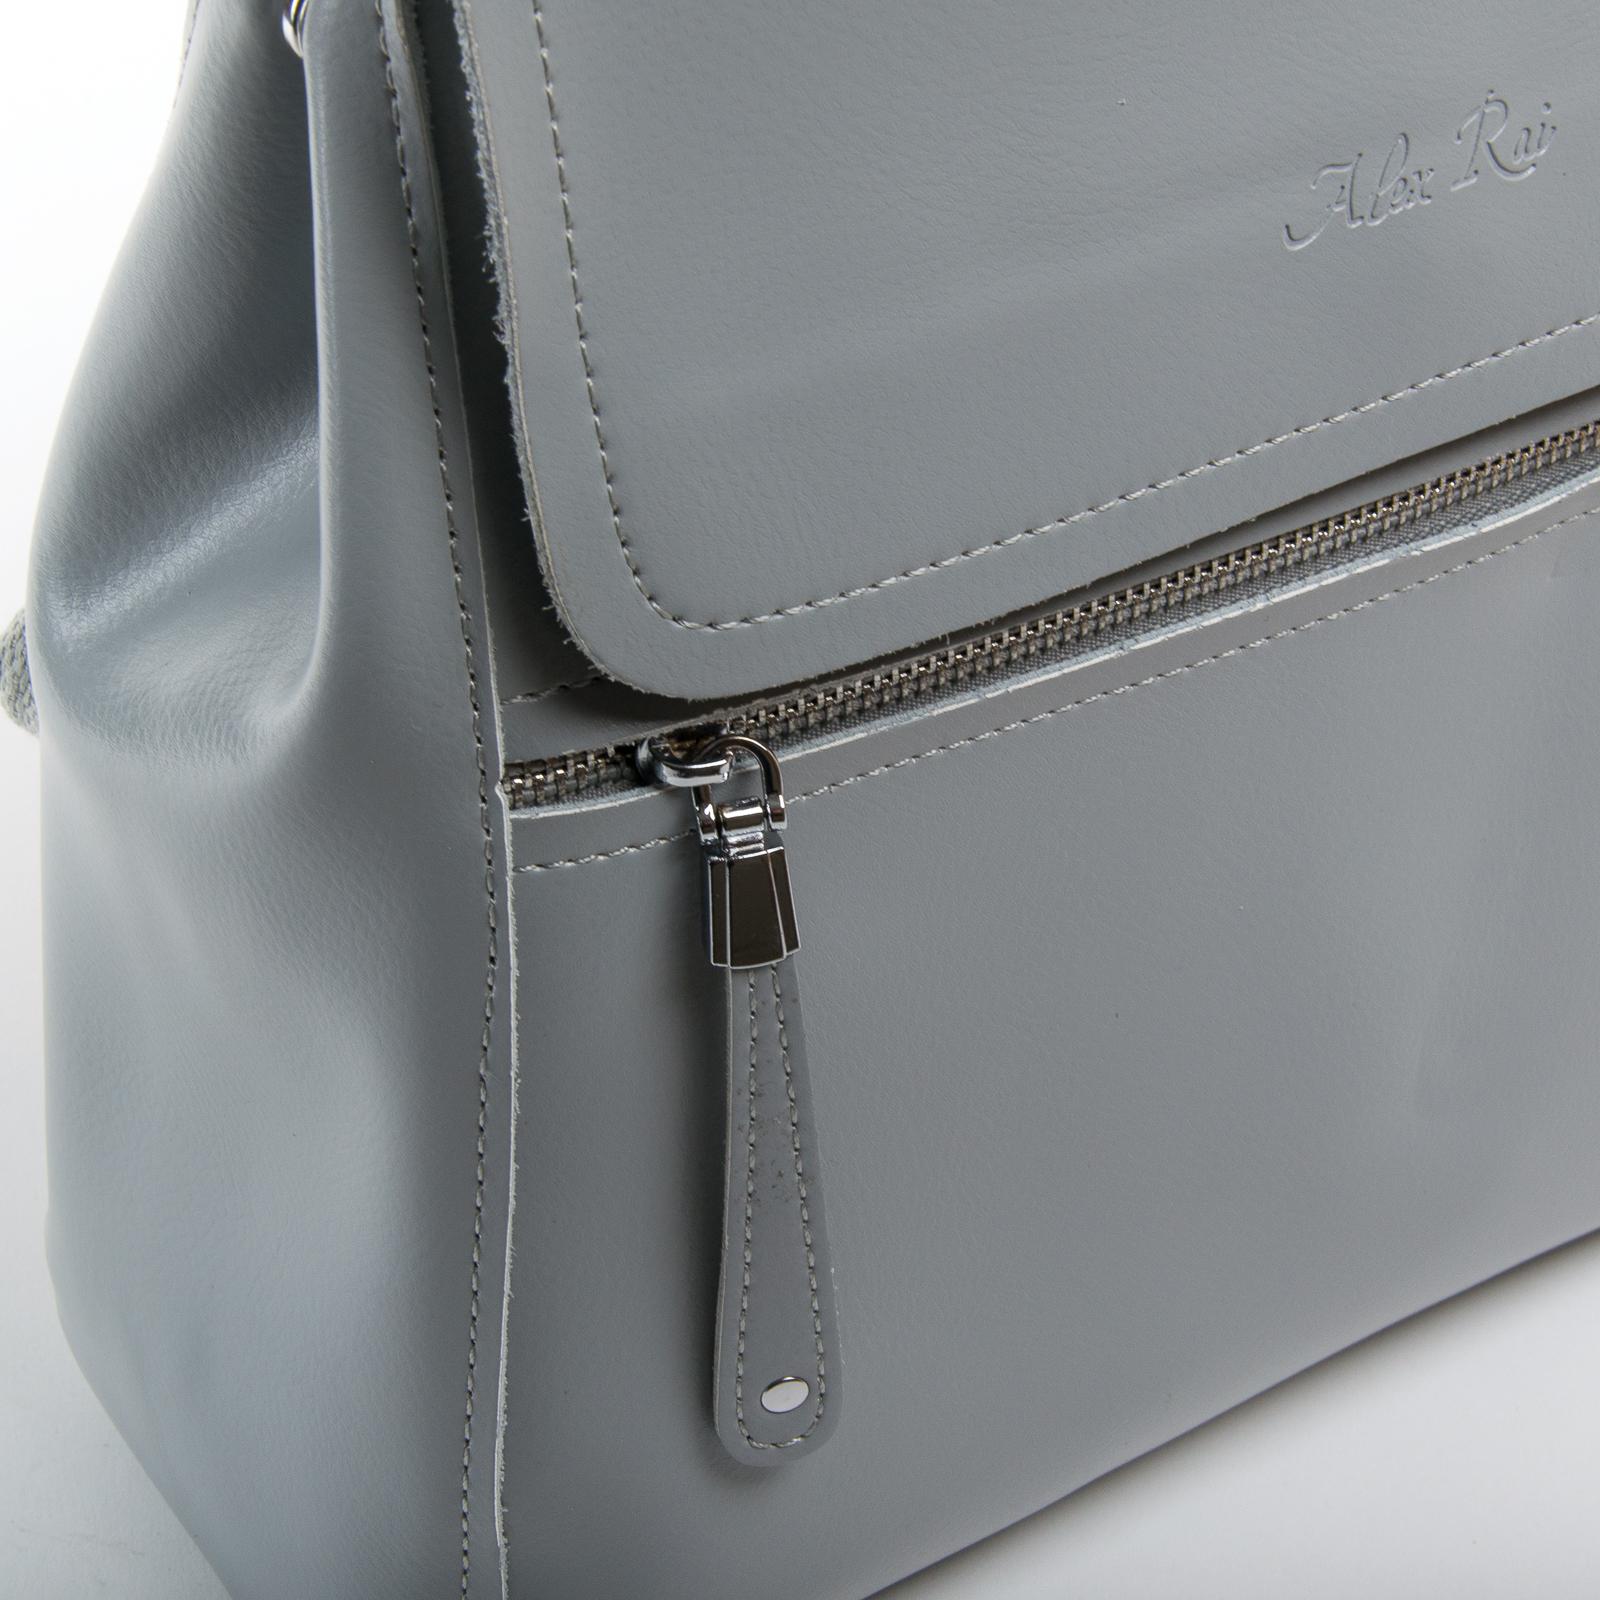 Сумка Женская Рюкзак кожа ALEX RAI 1005 l-grey - фото 3